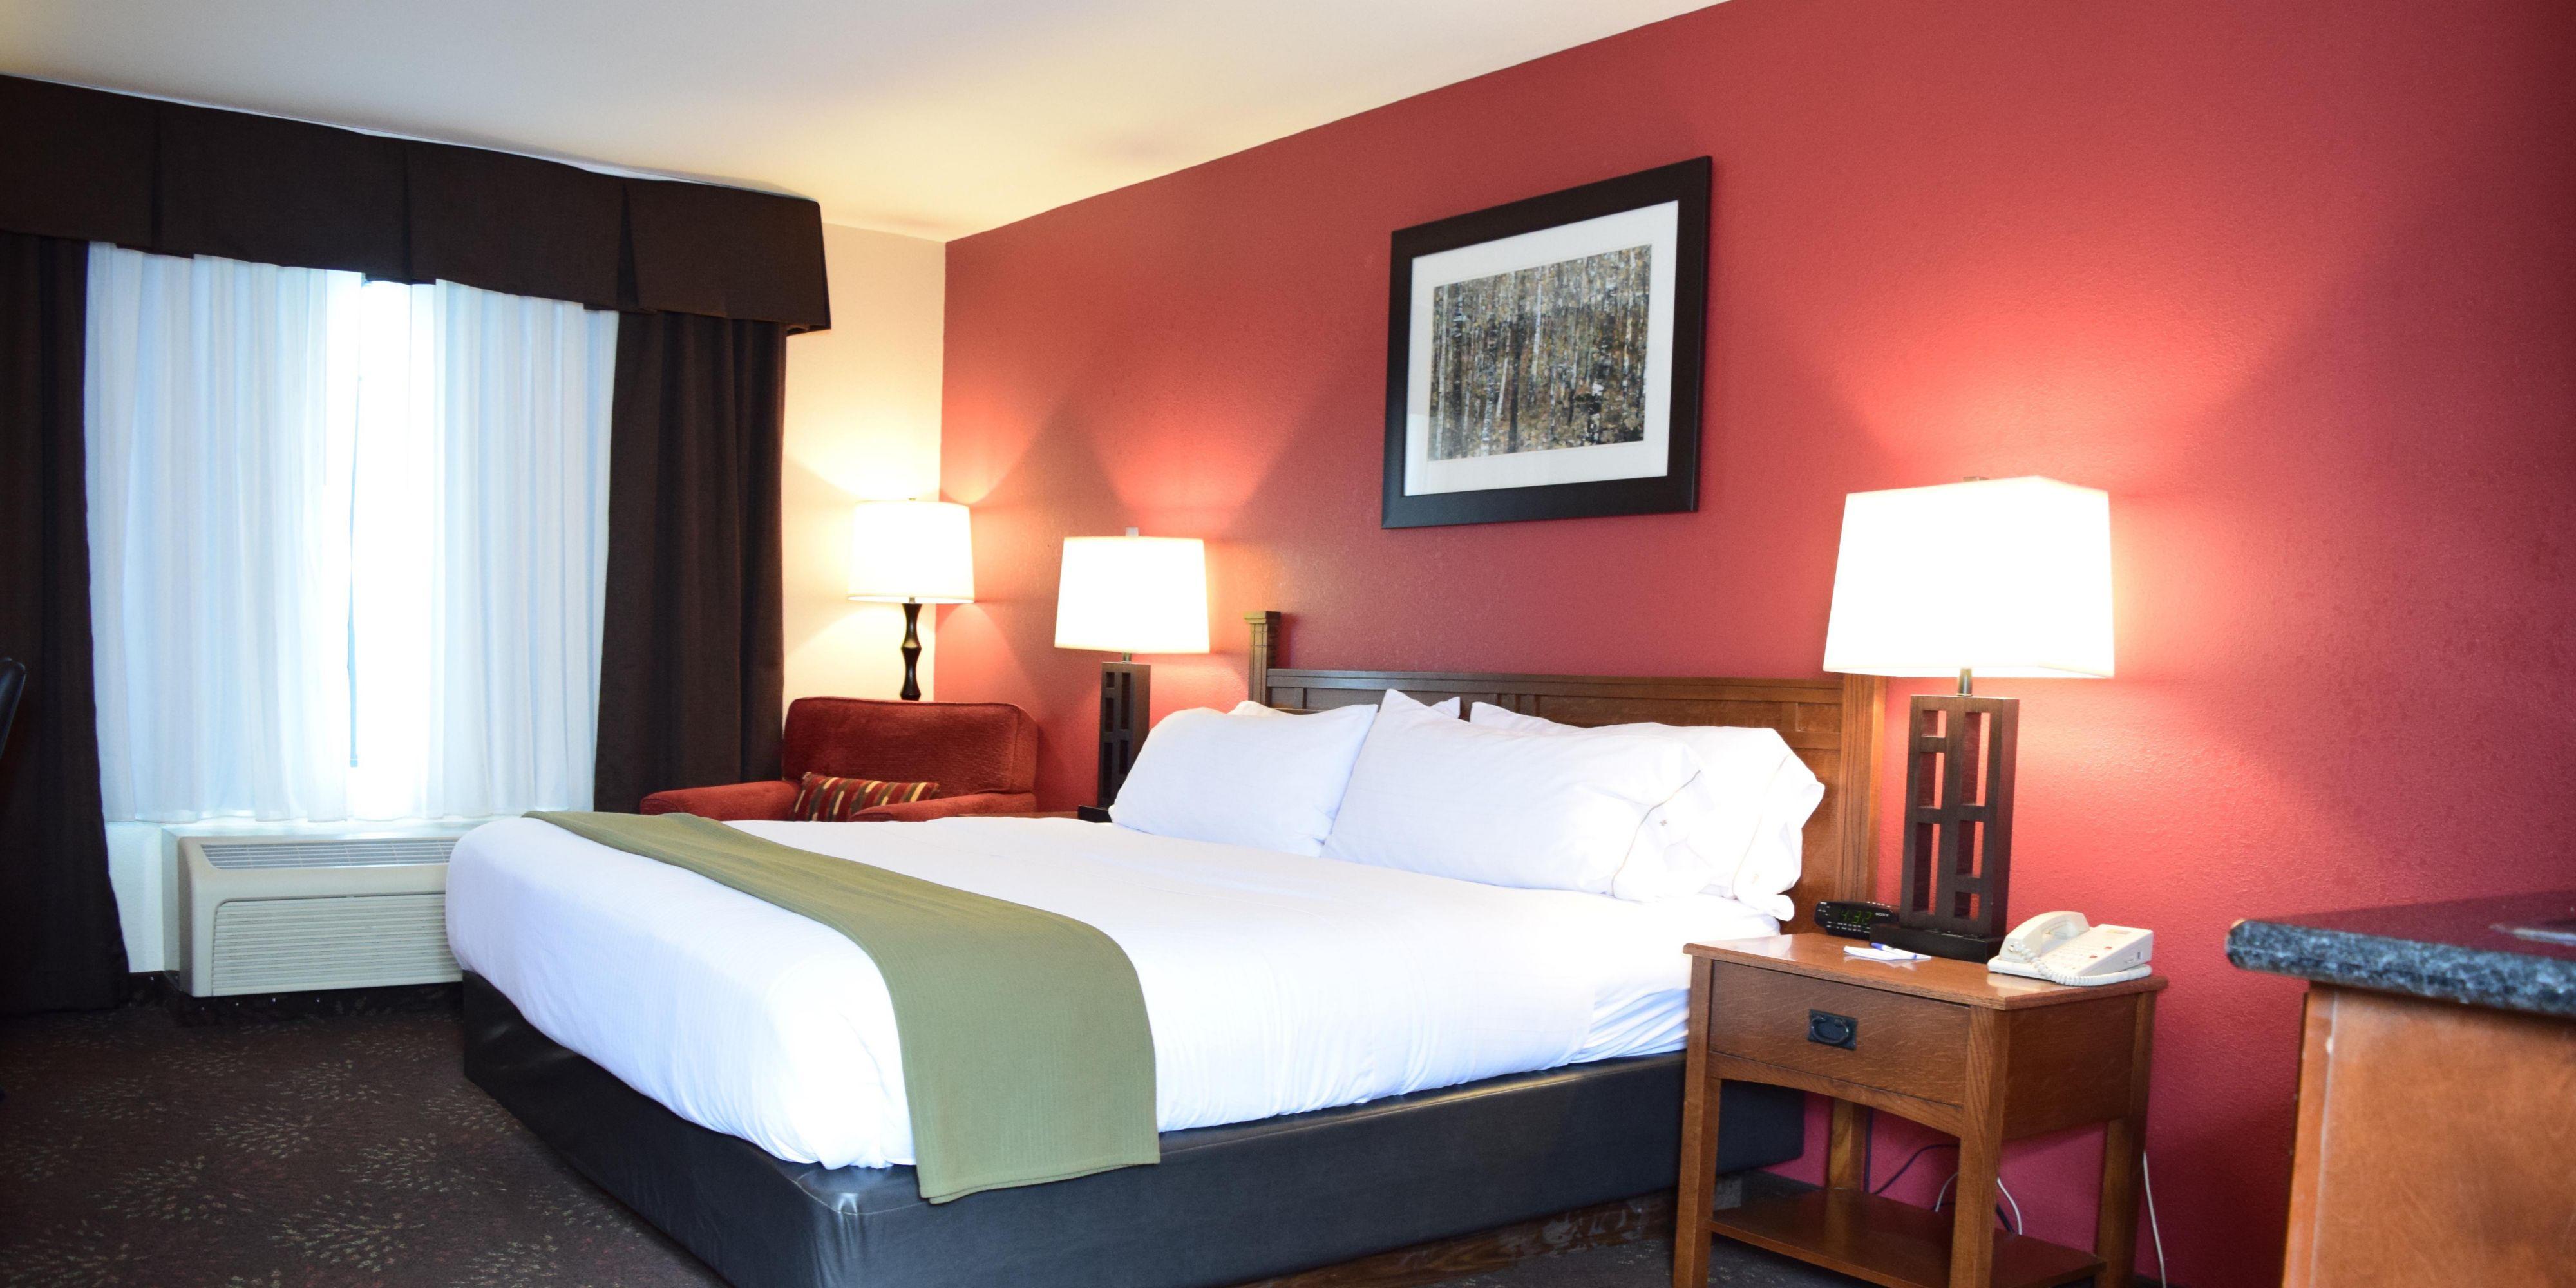 Holiday Inn Express Logan 3997289017 2x1